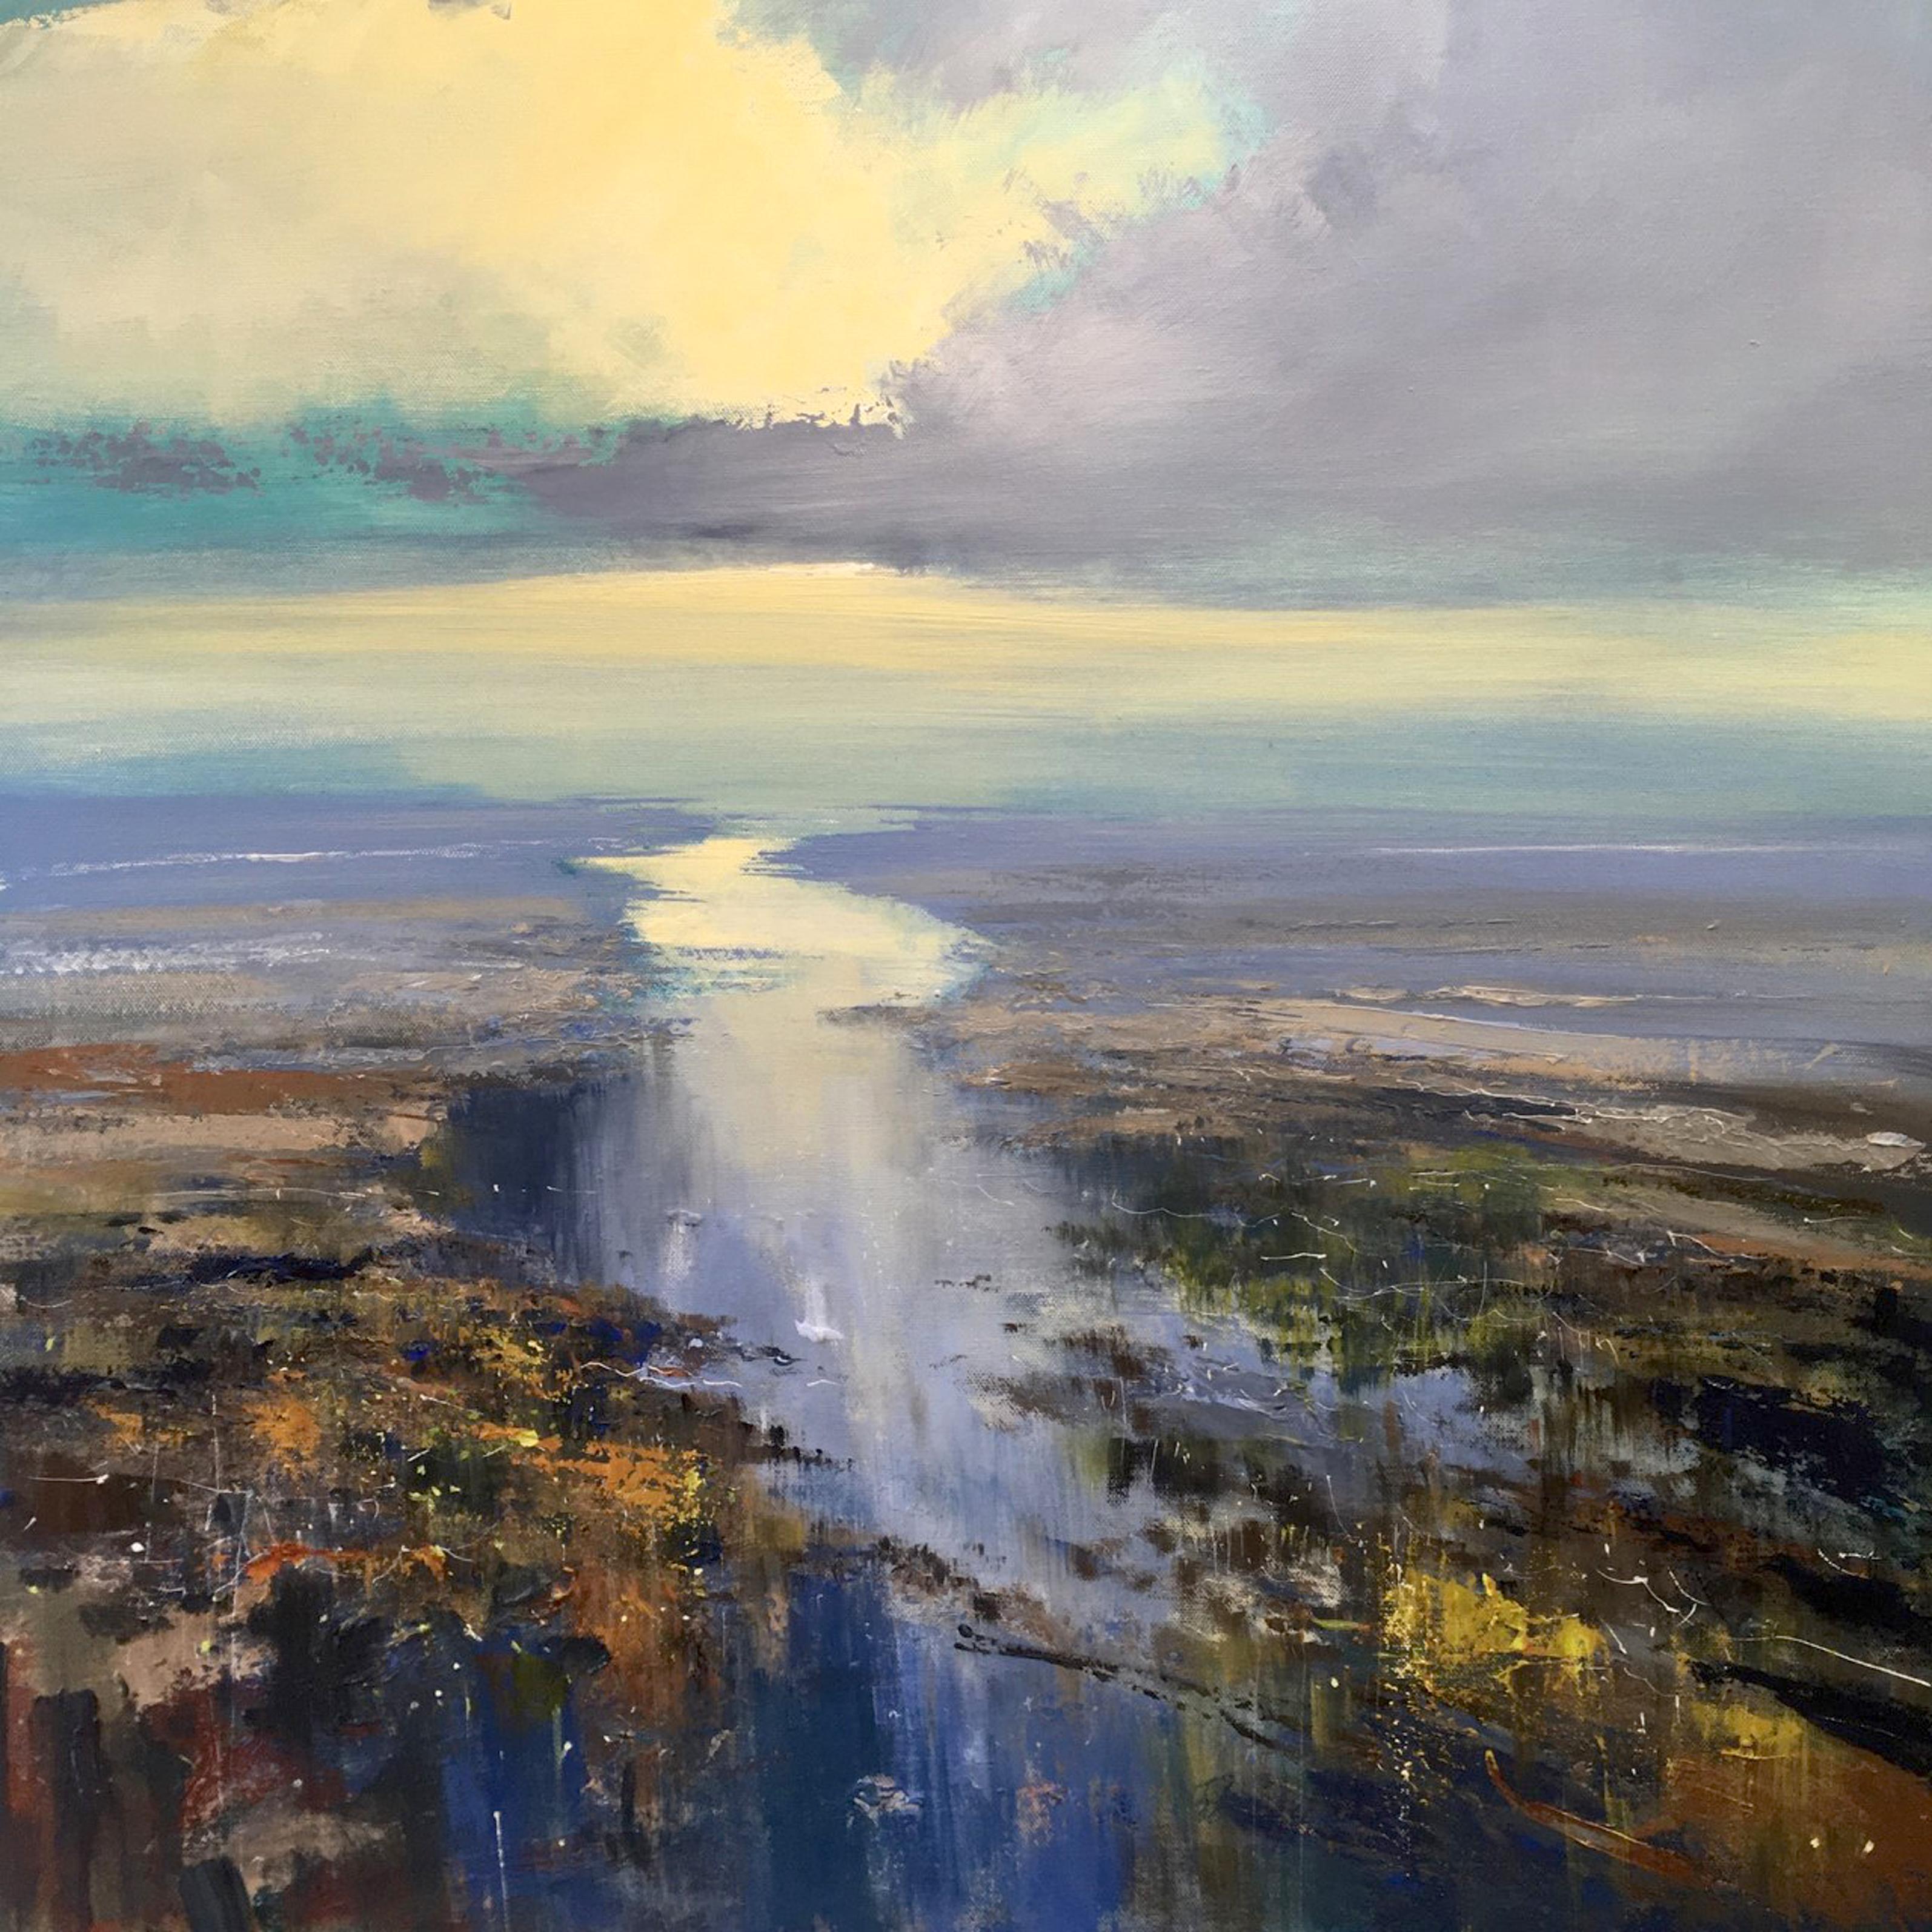 Stillness of the Estuary - seascape painting Contemporary 21st C modern art